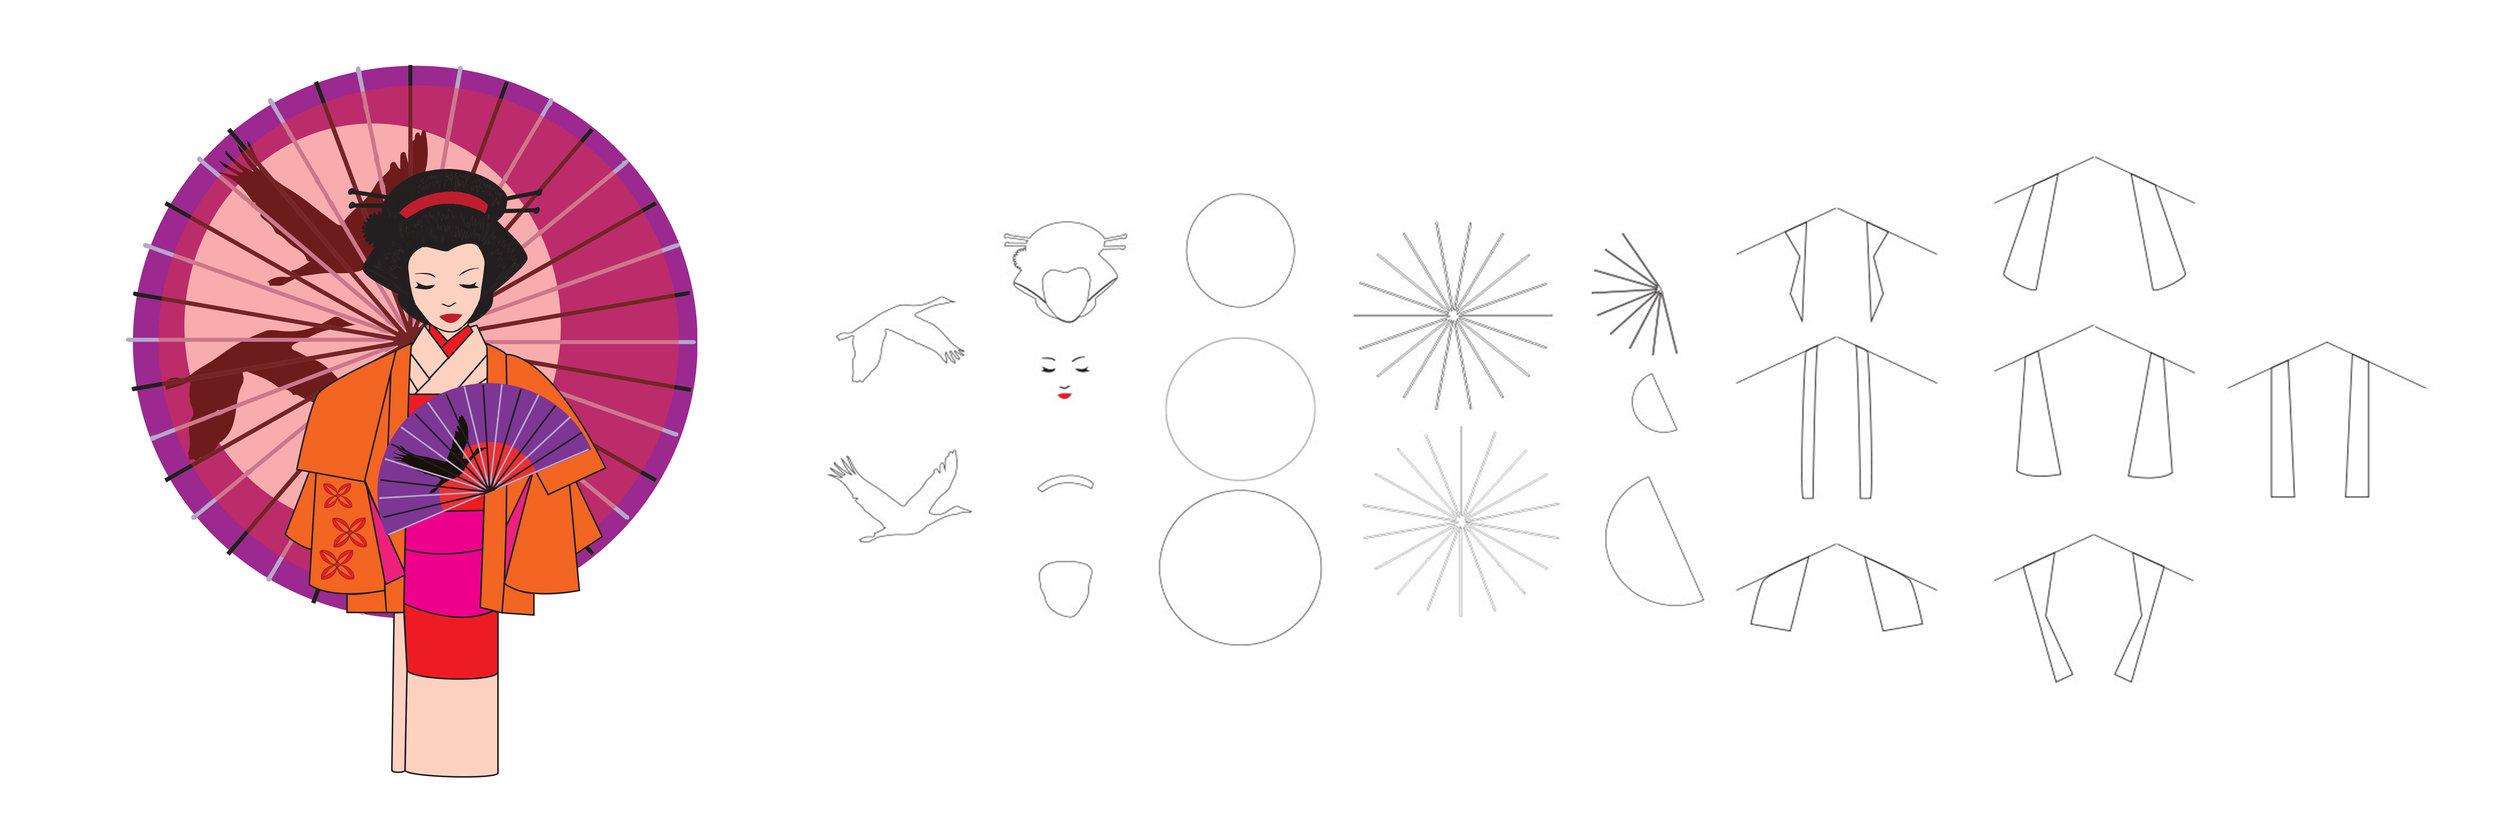 Process-Design-Illustration-WIP.jpg